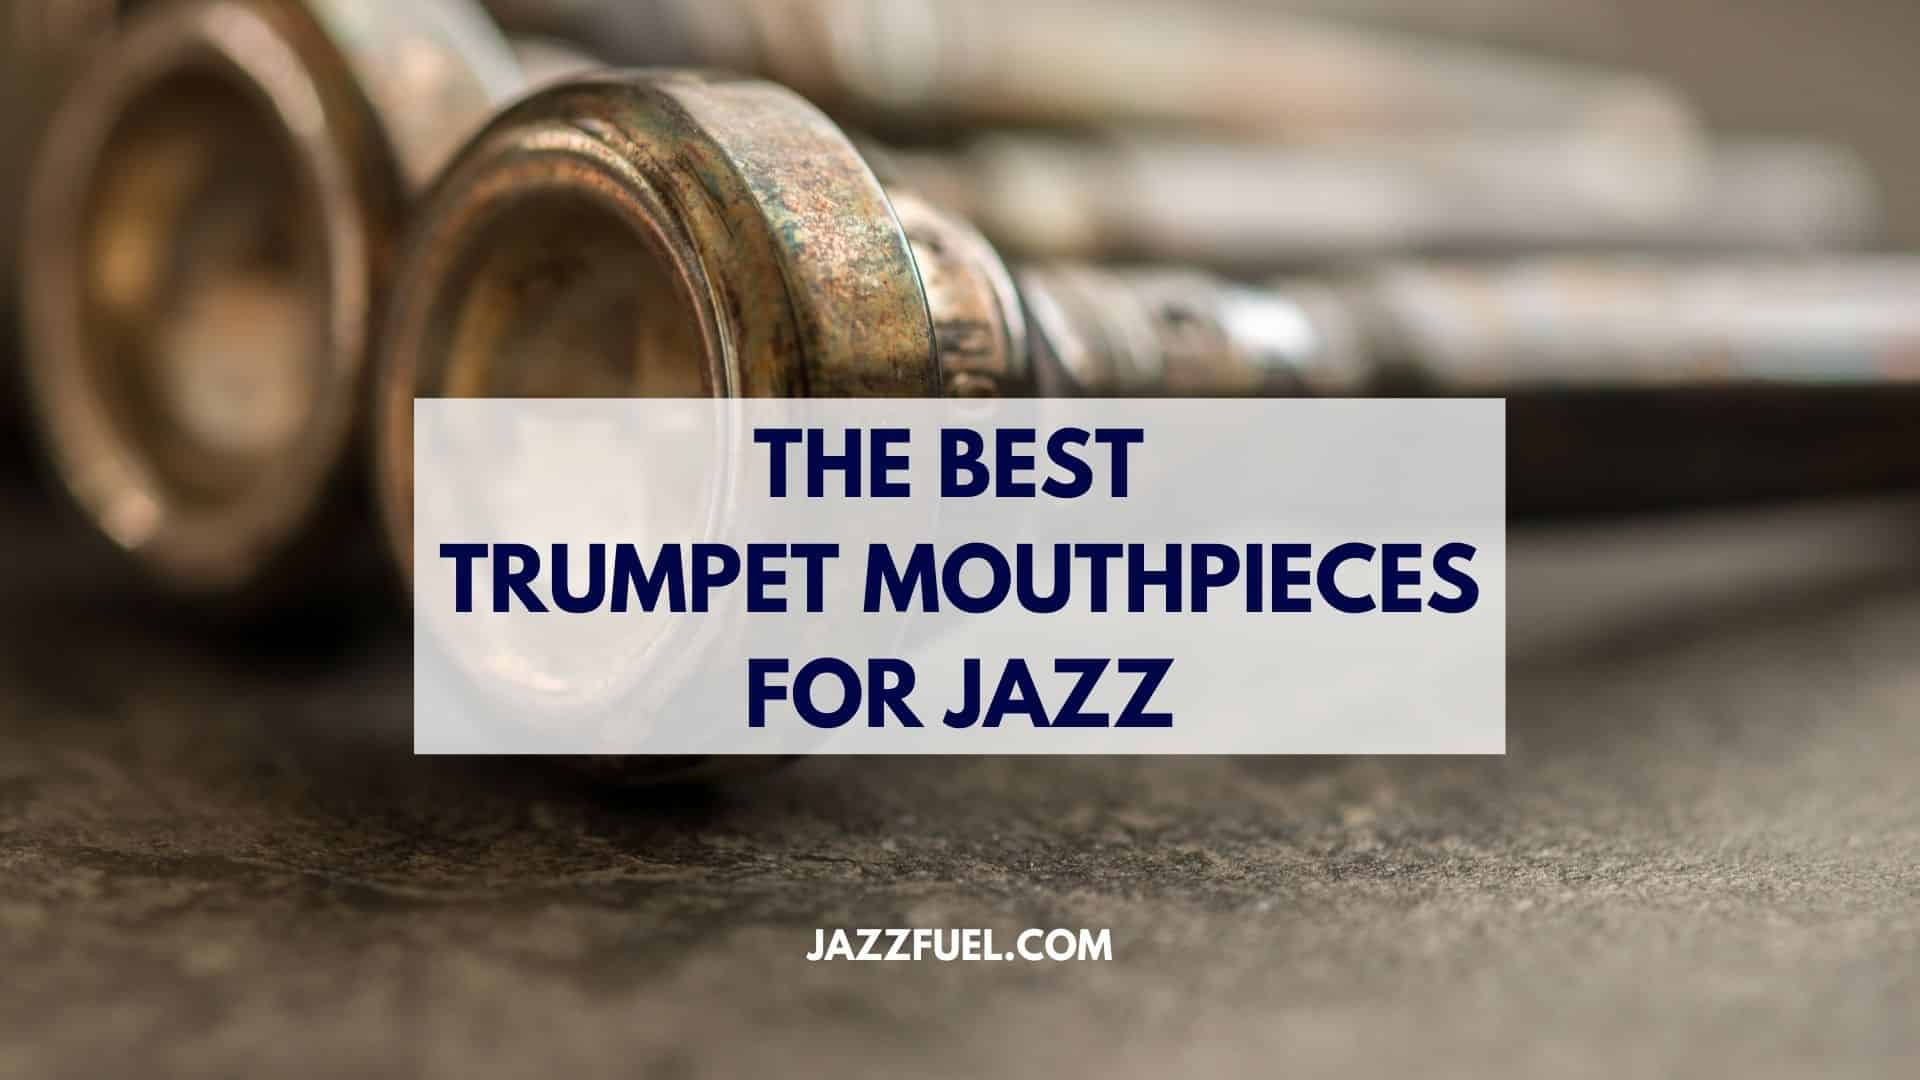 jazz trumpet mouthpieces